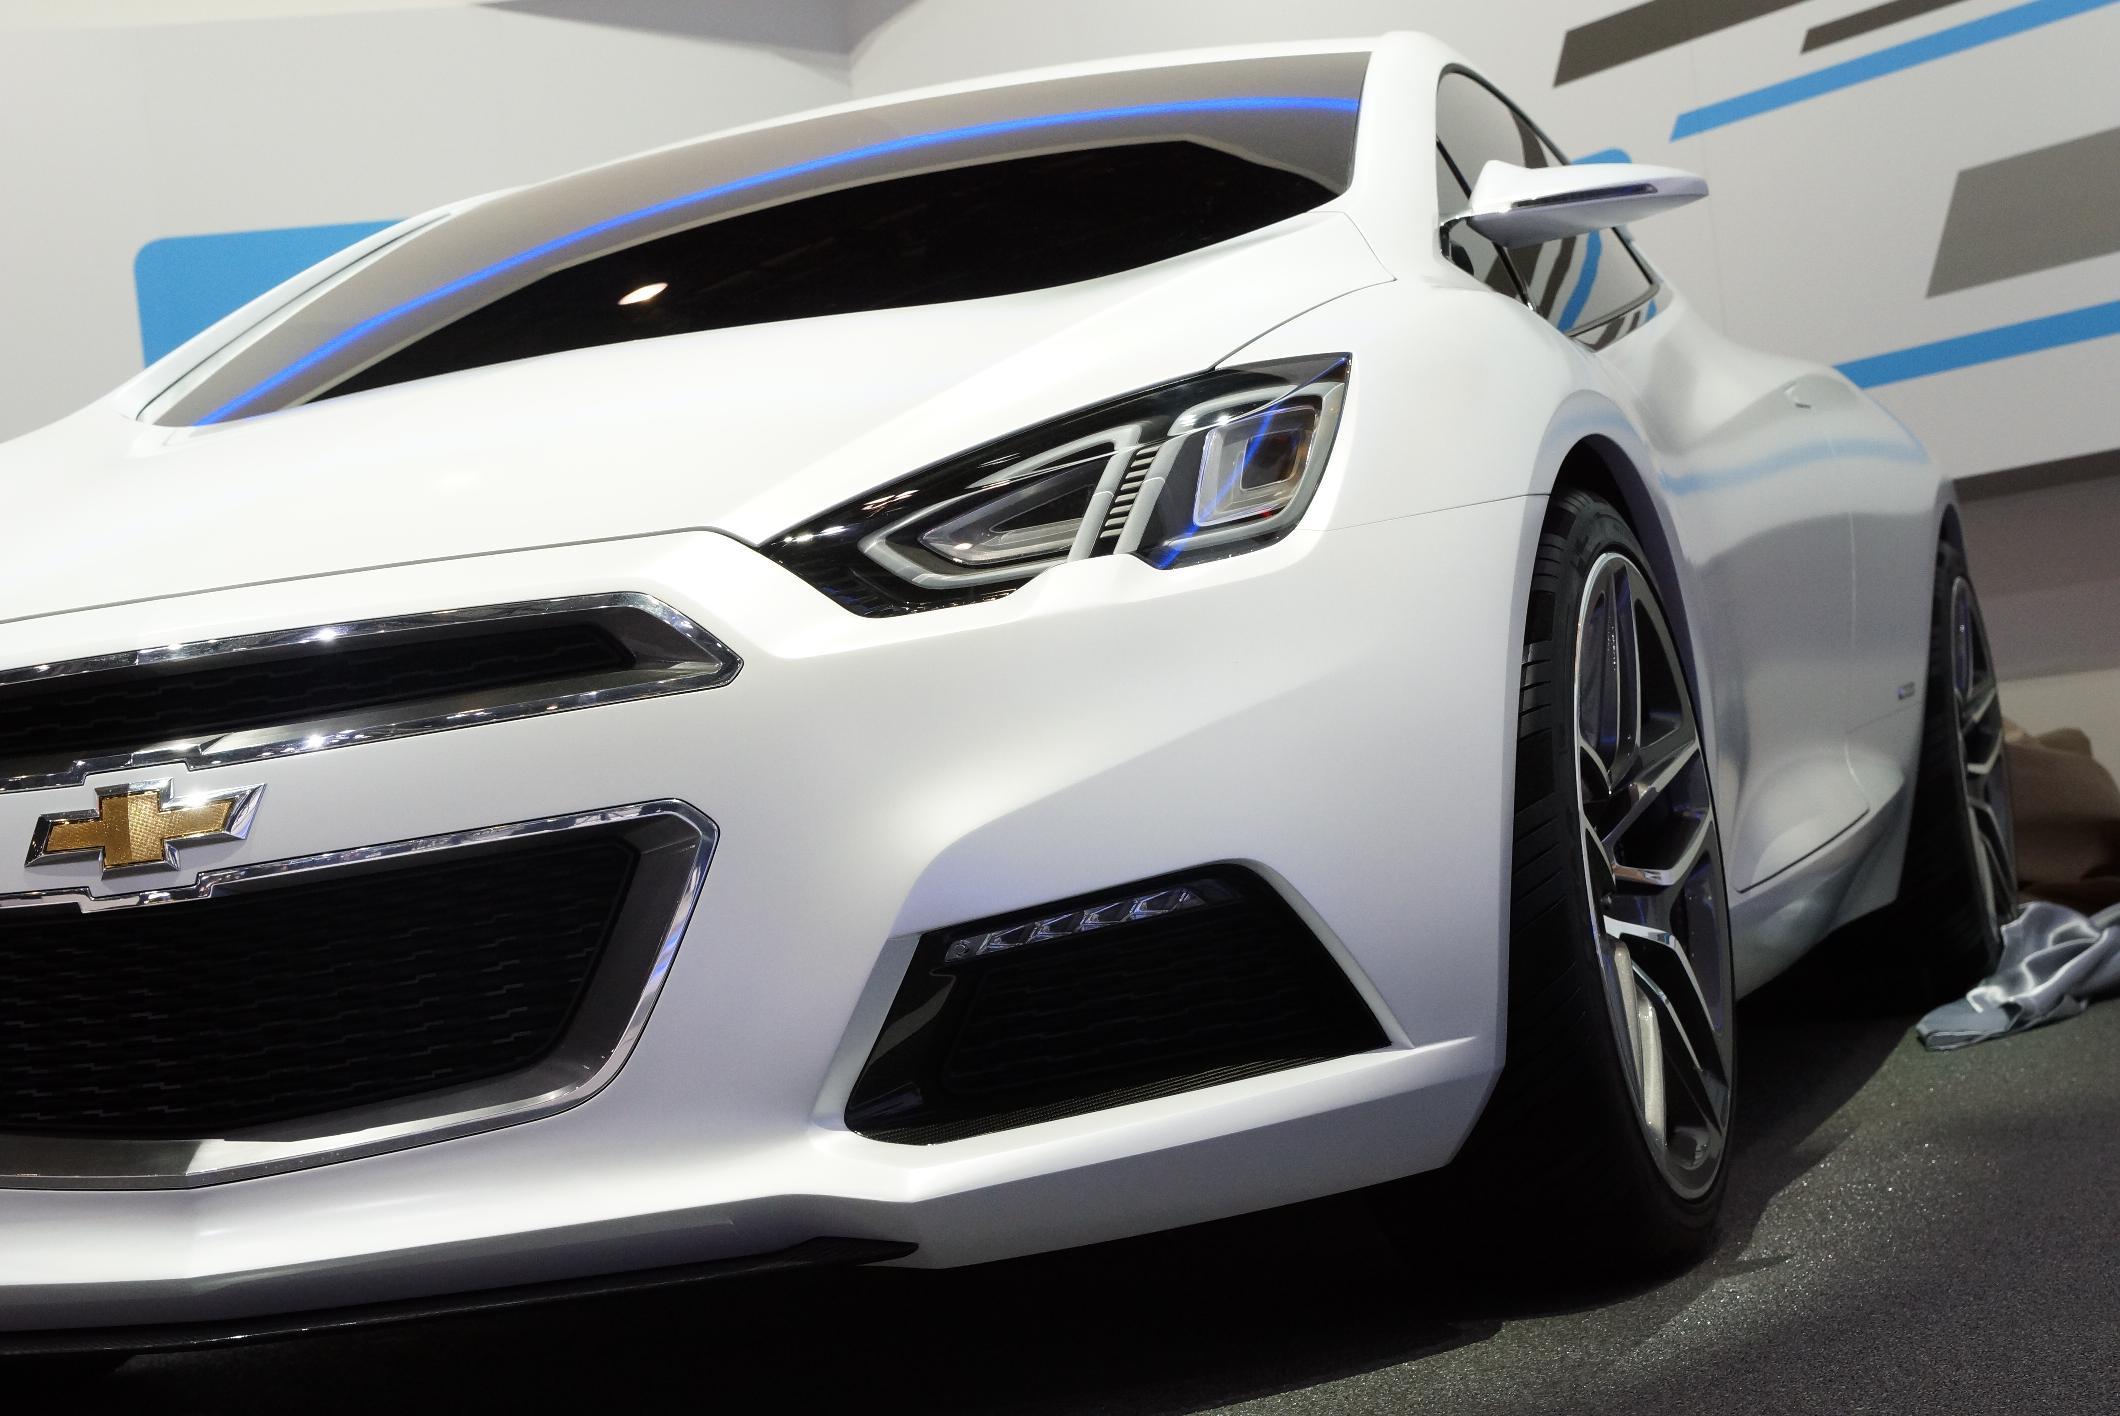 Chevrolet concept Tru 140S Geneva 2012 Grille